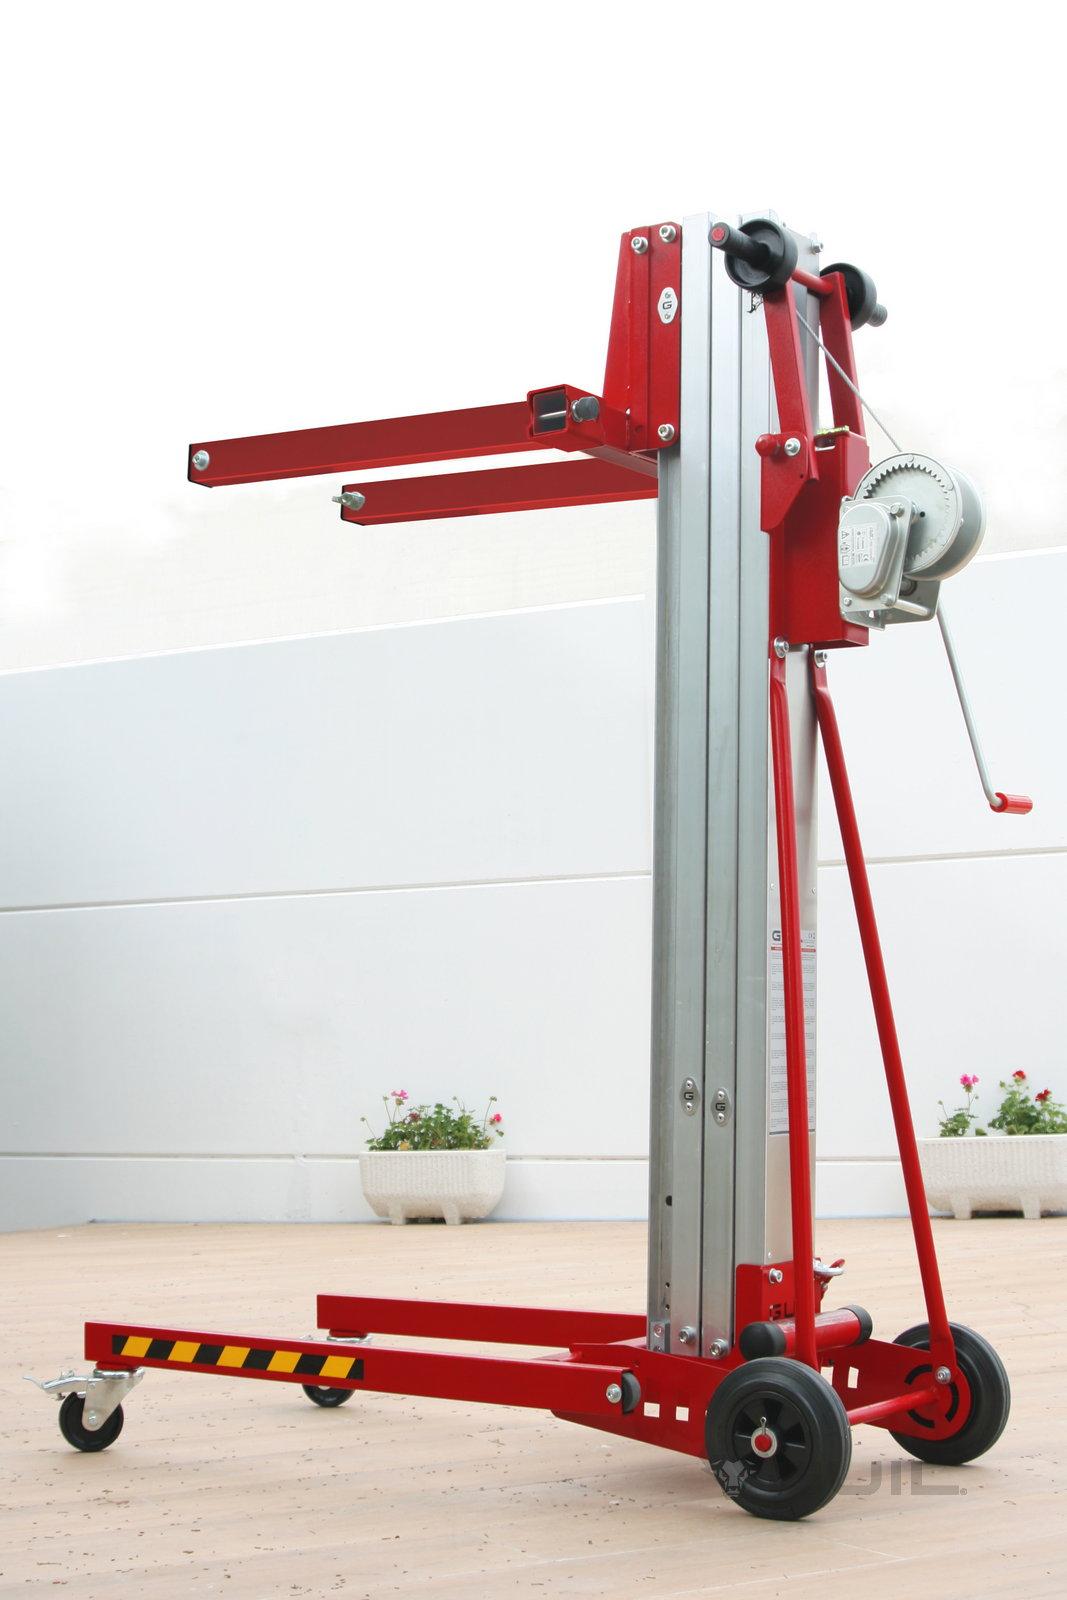 Kanaallift 2,90 m 170 kg (dutch) (4)